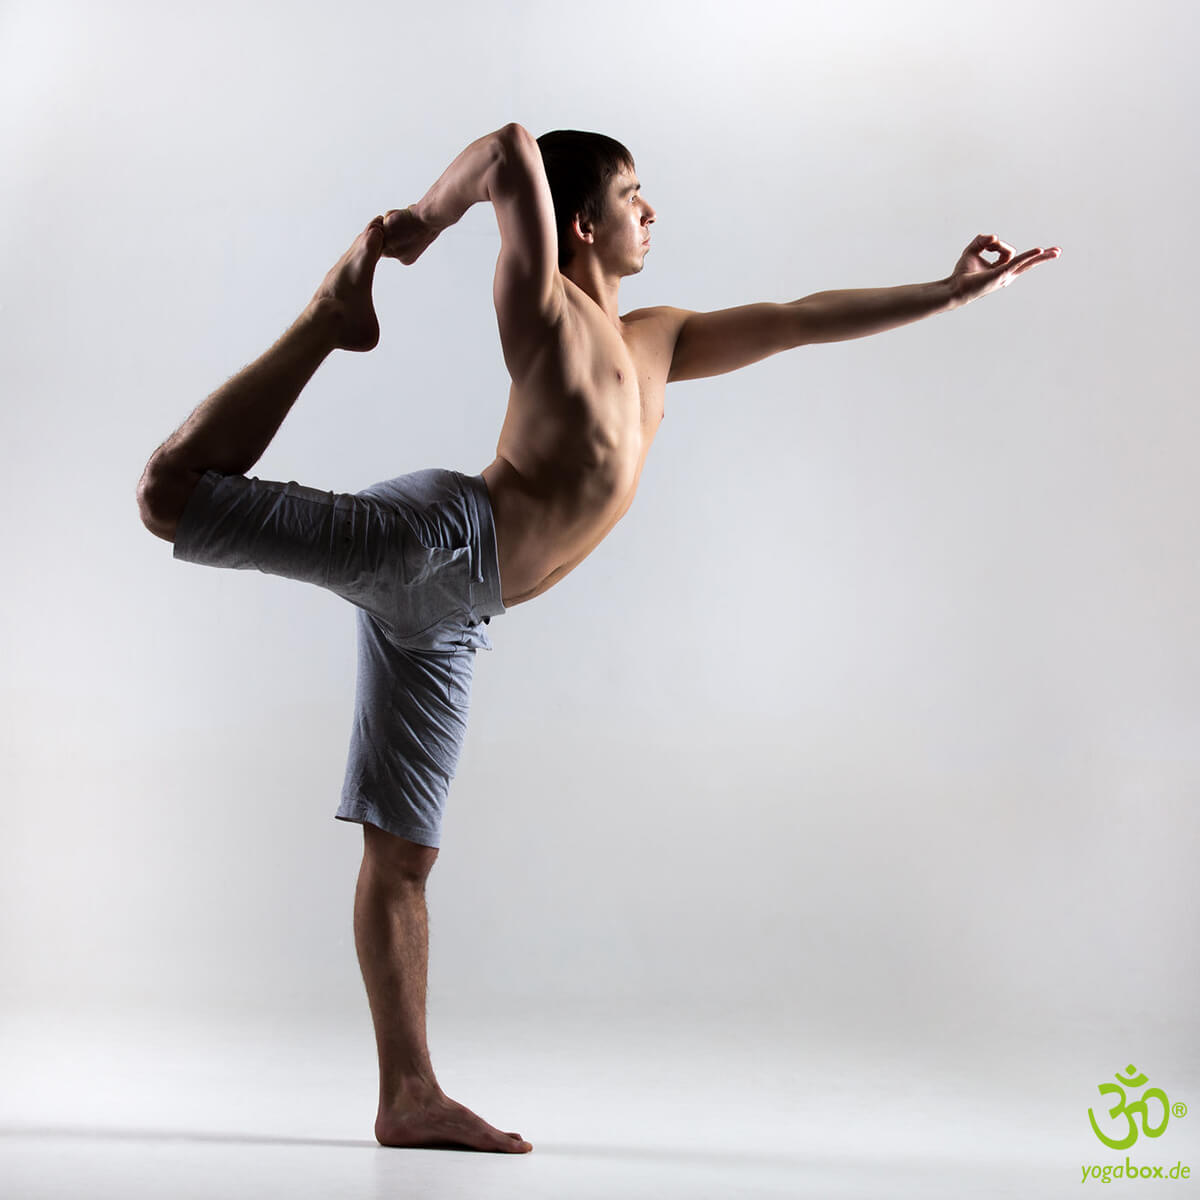 Shivas Tanzhaltung (Natarajasana)